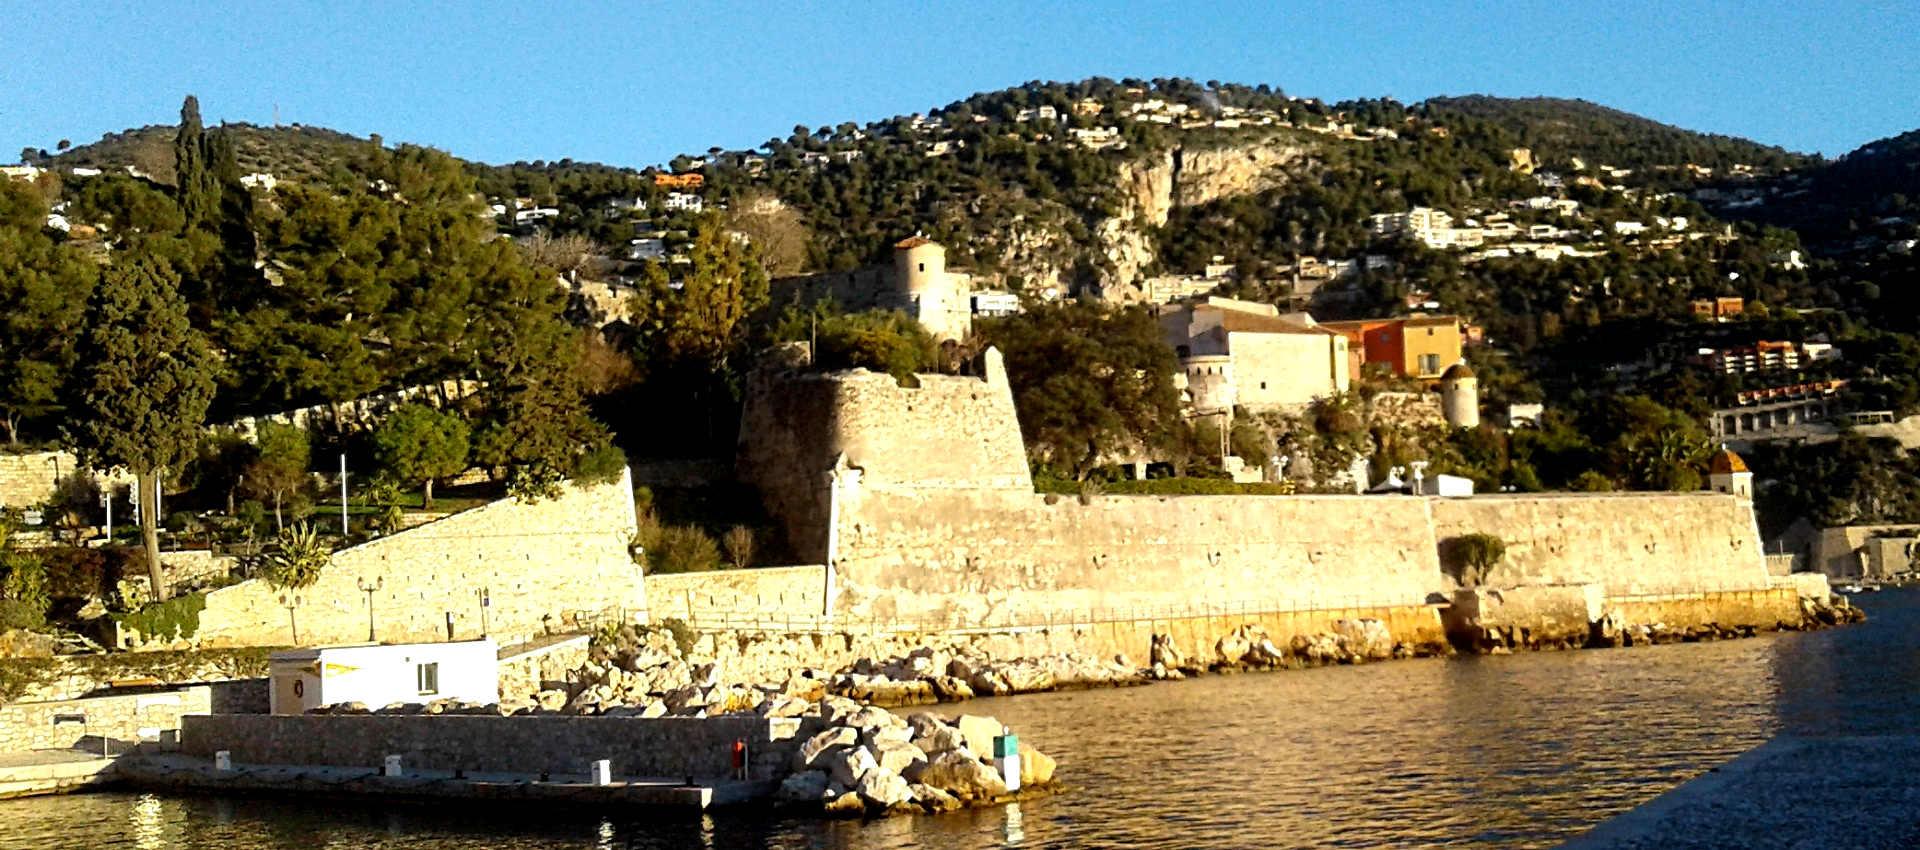 citadelle Saint-Elme - Villefranche/Mer